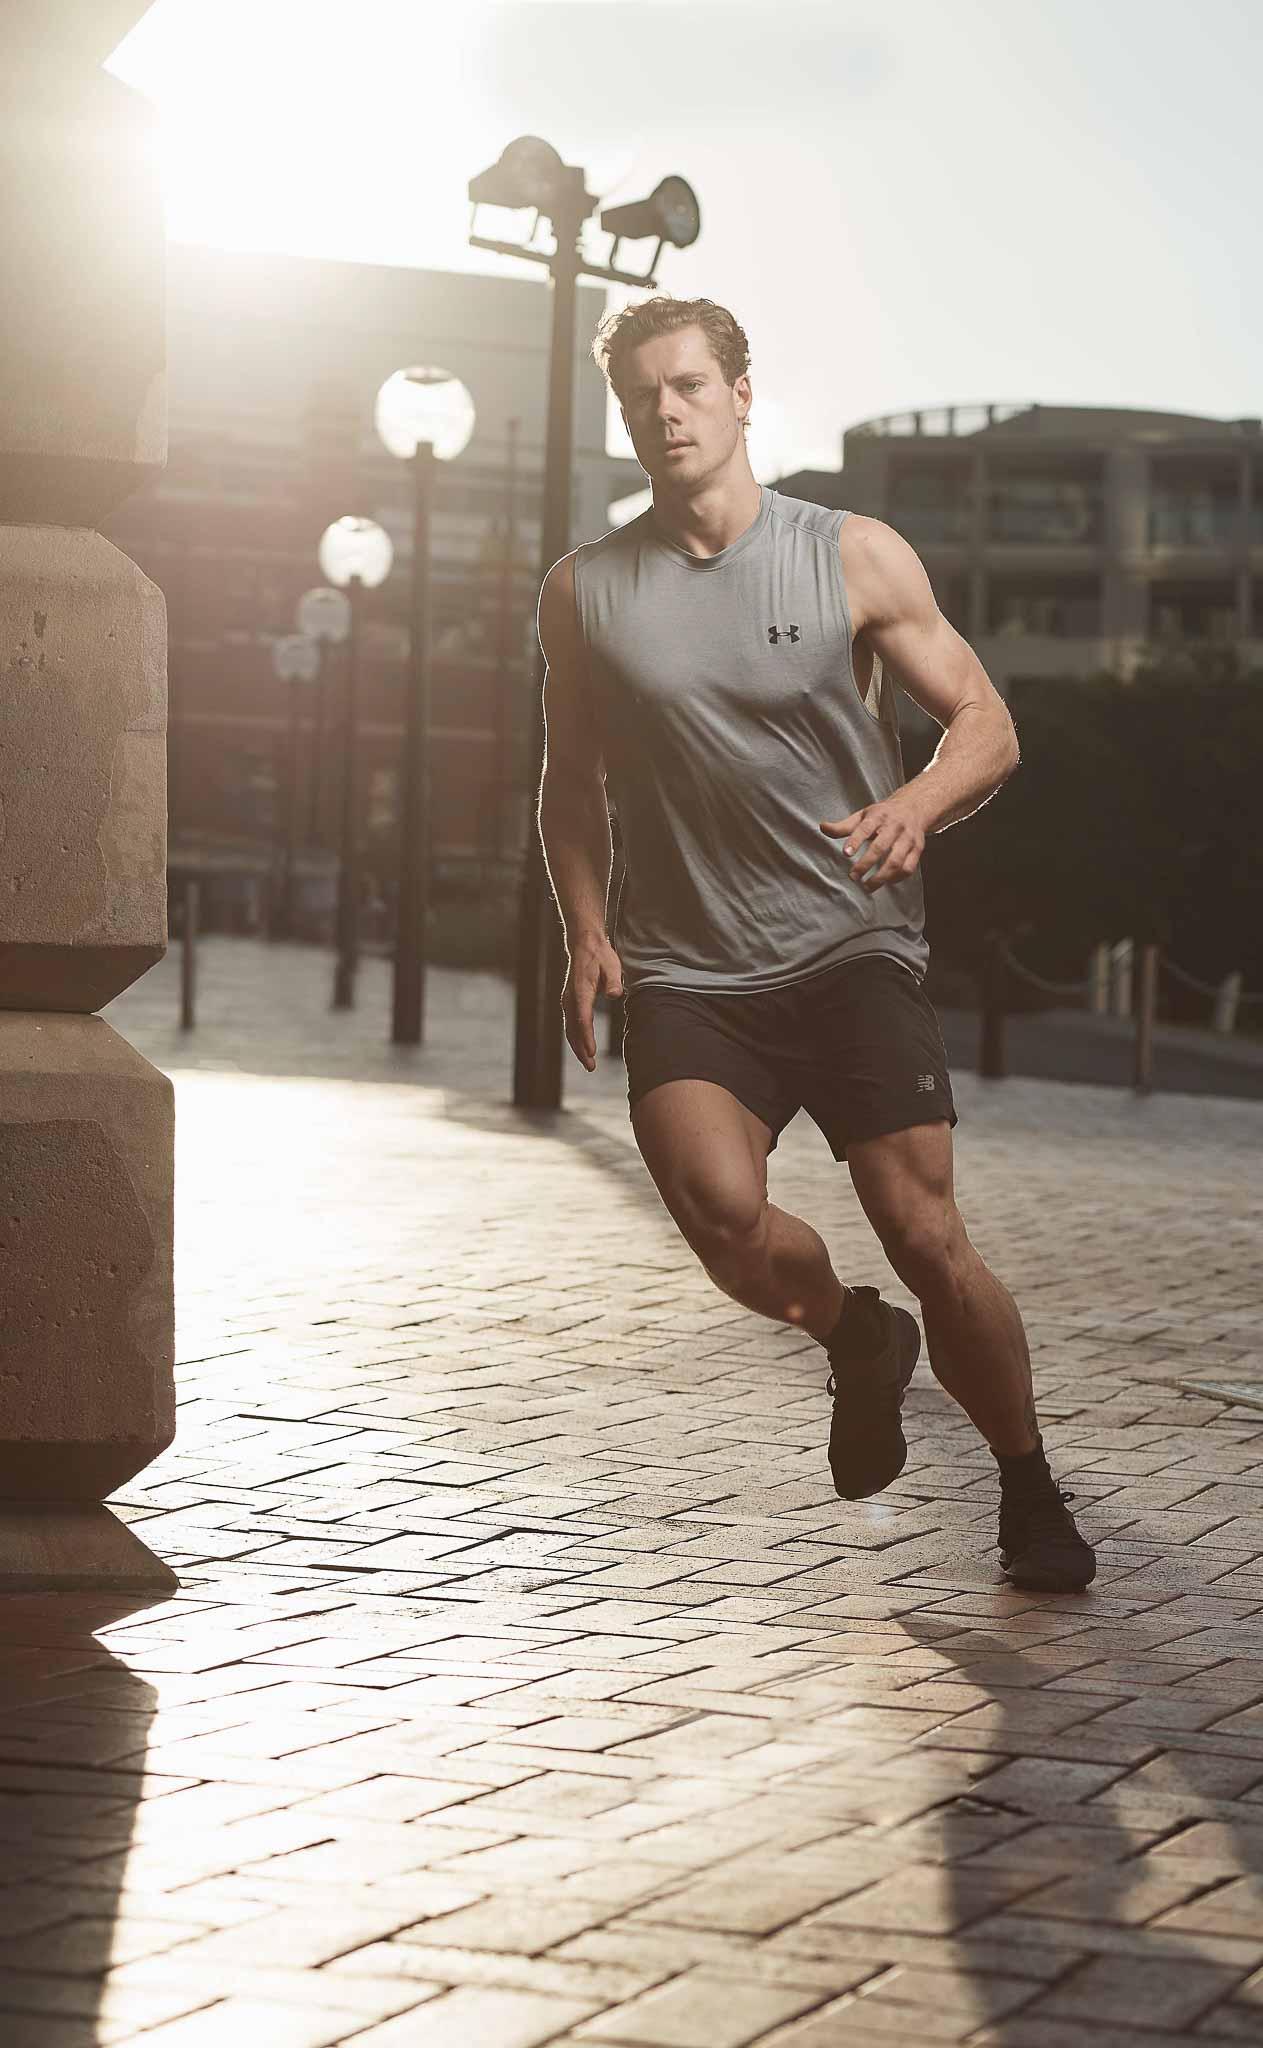 James Sydneys elite fitness model